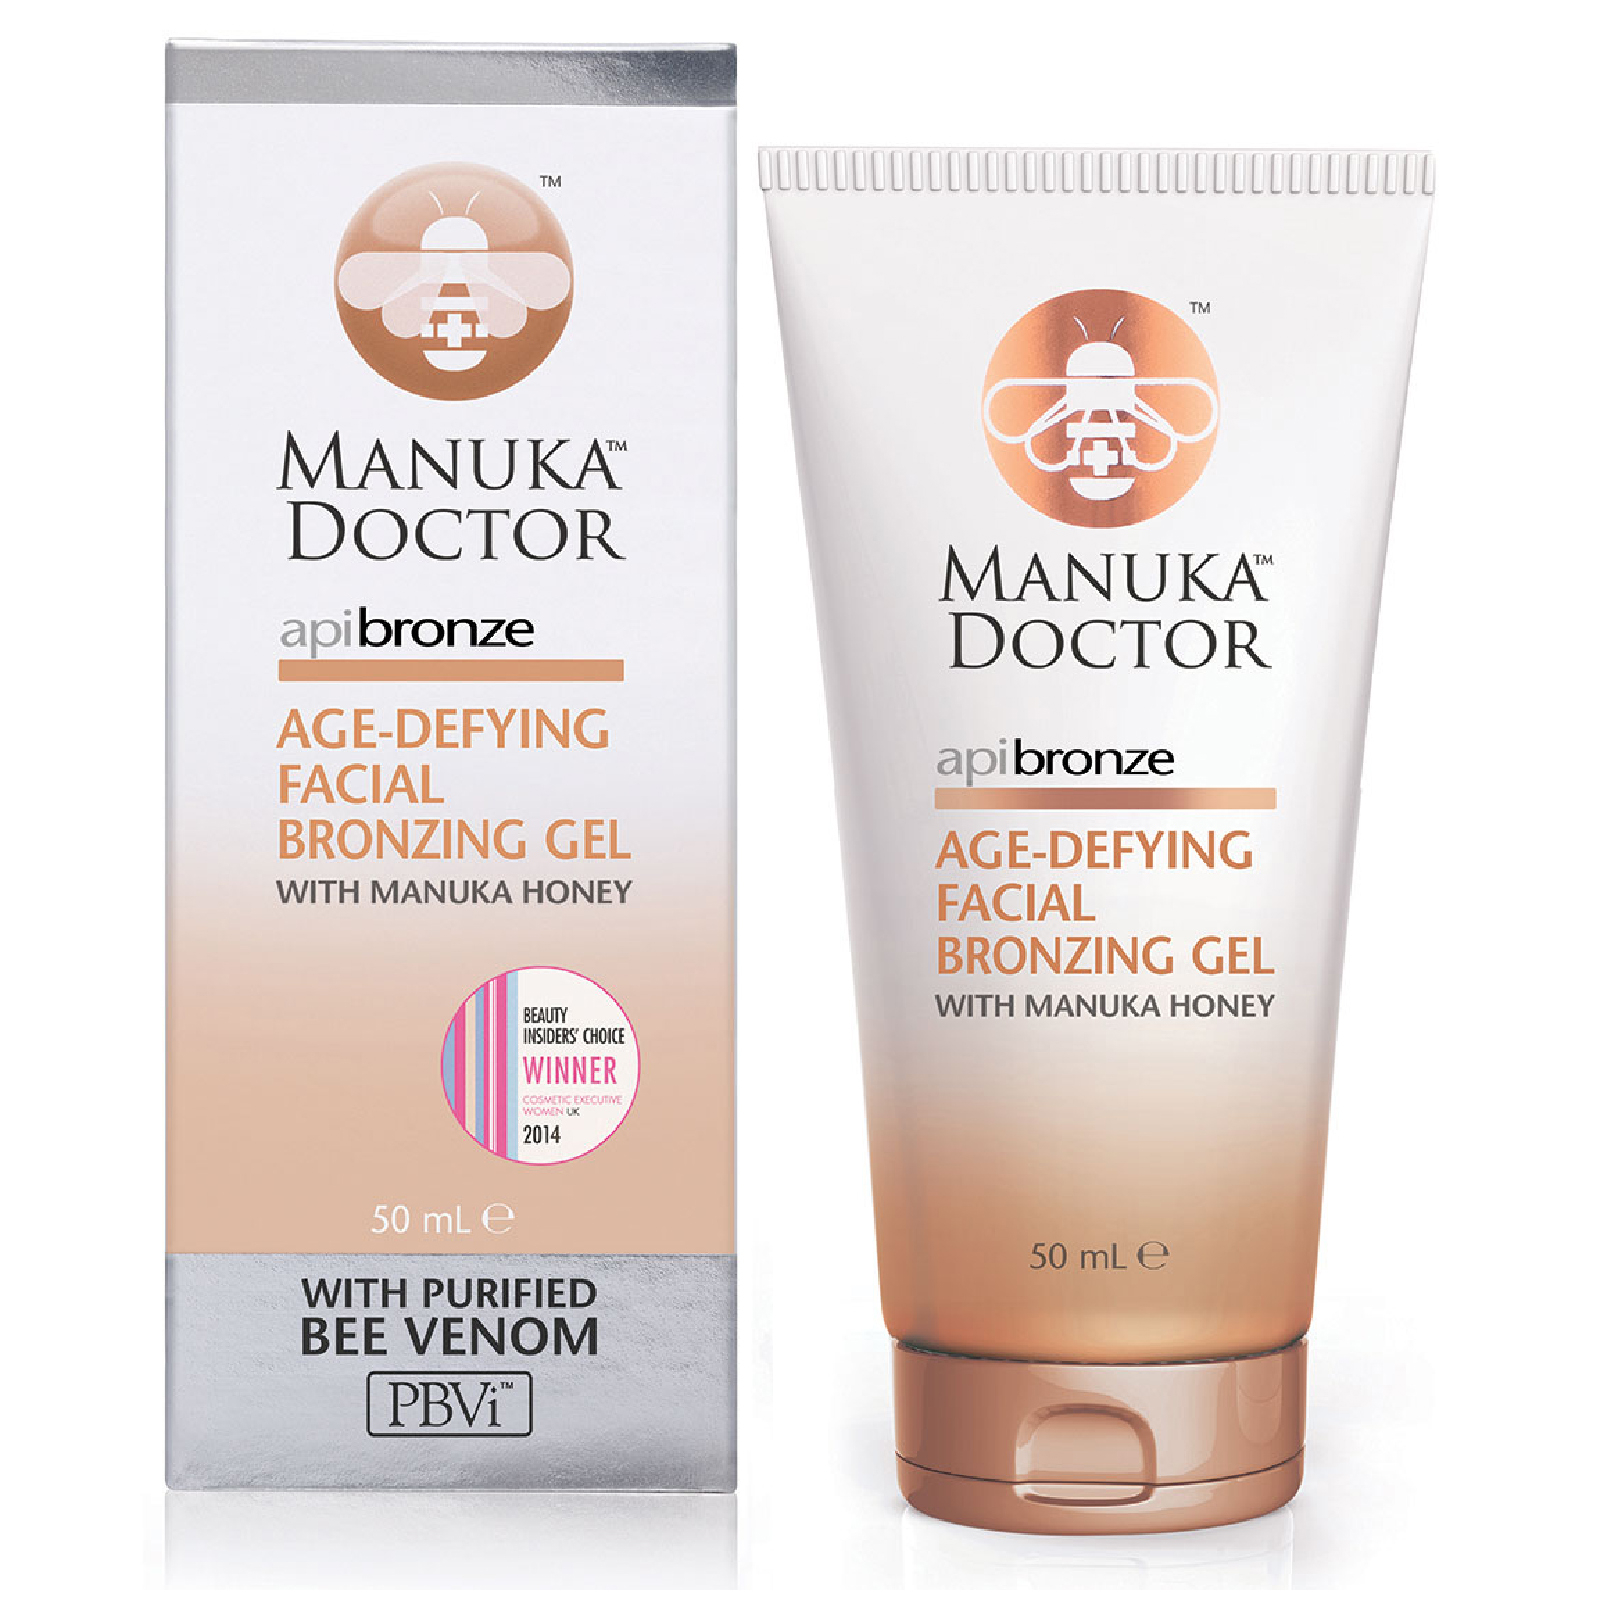 Manuka Doctor ApiBronze gel autoabbronzante viso anti-età 50 ml